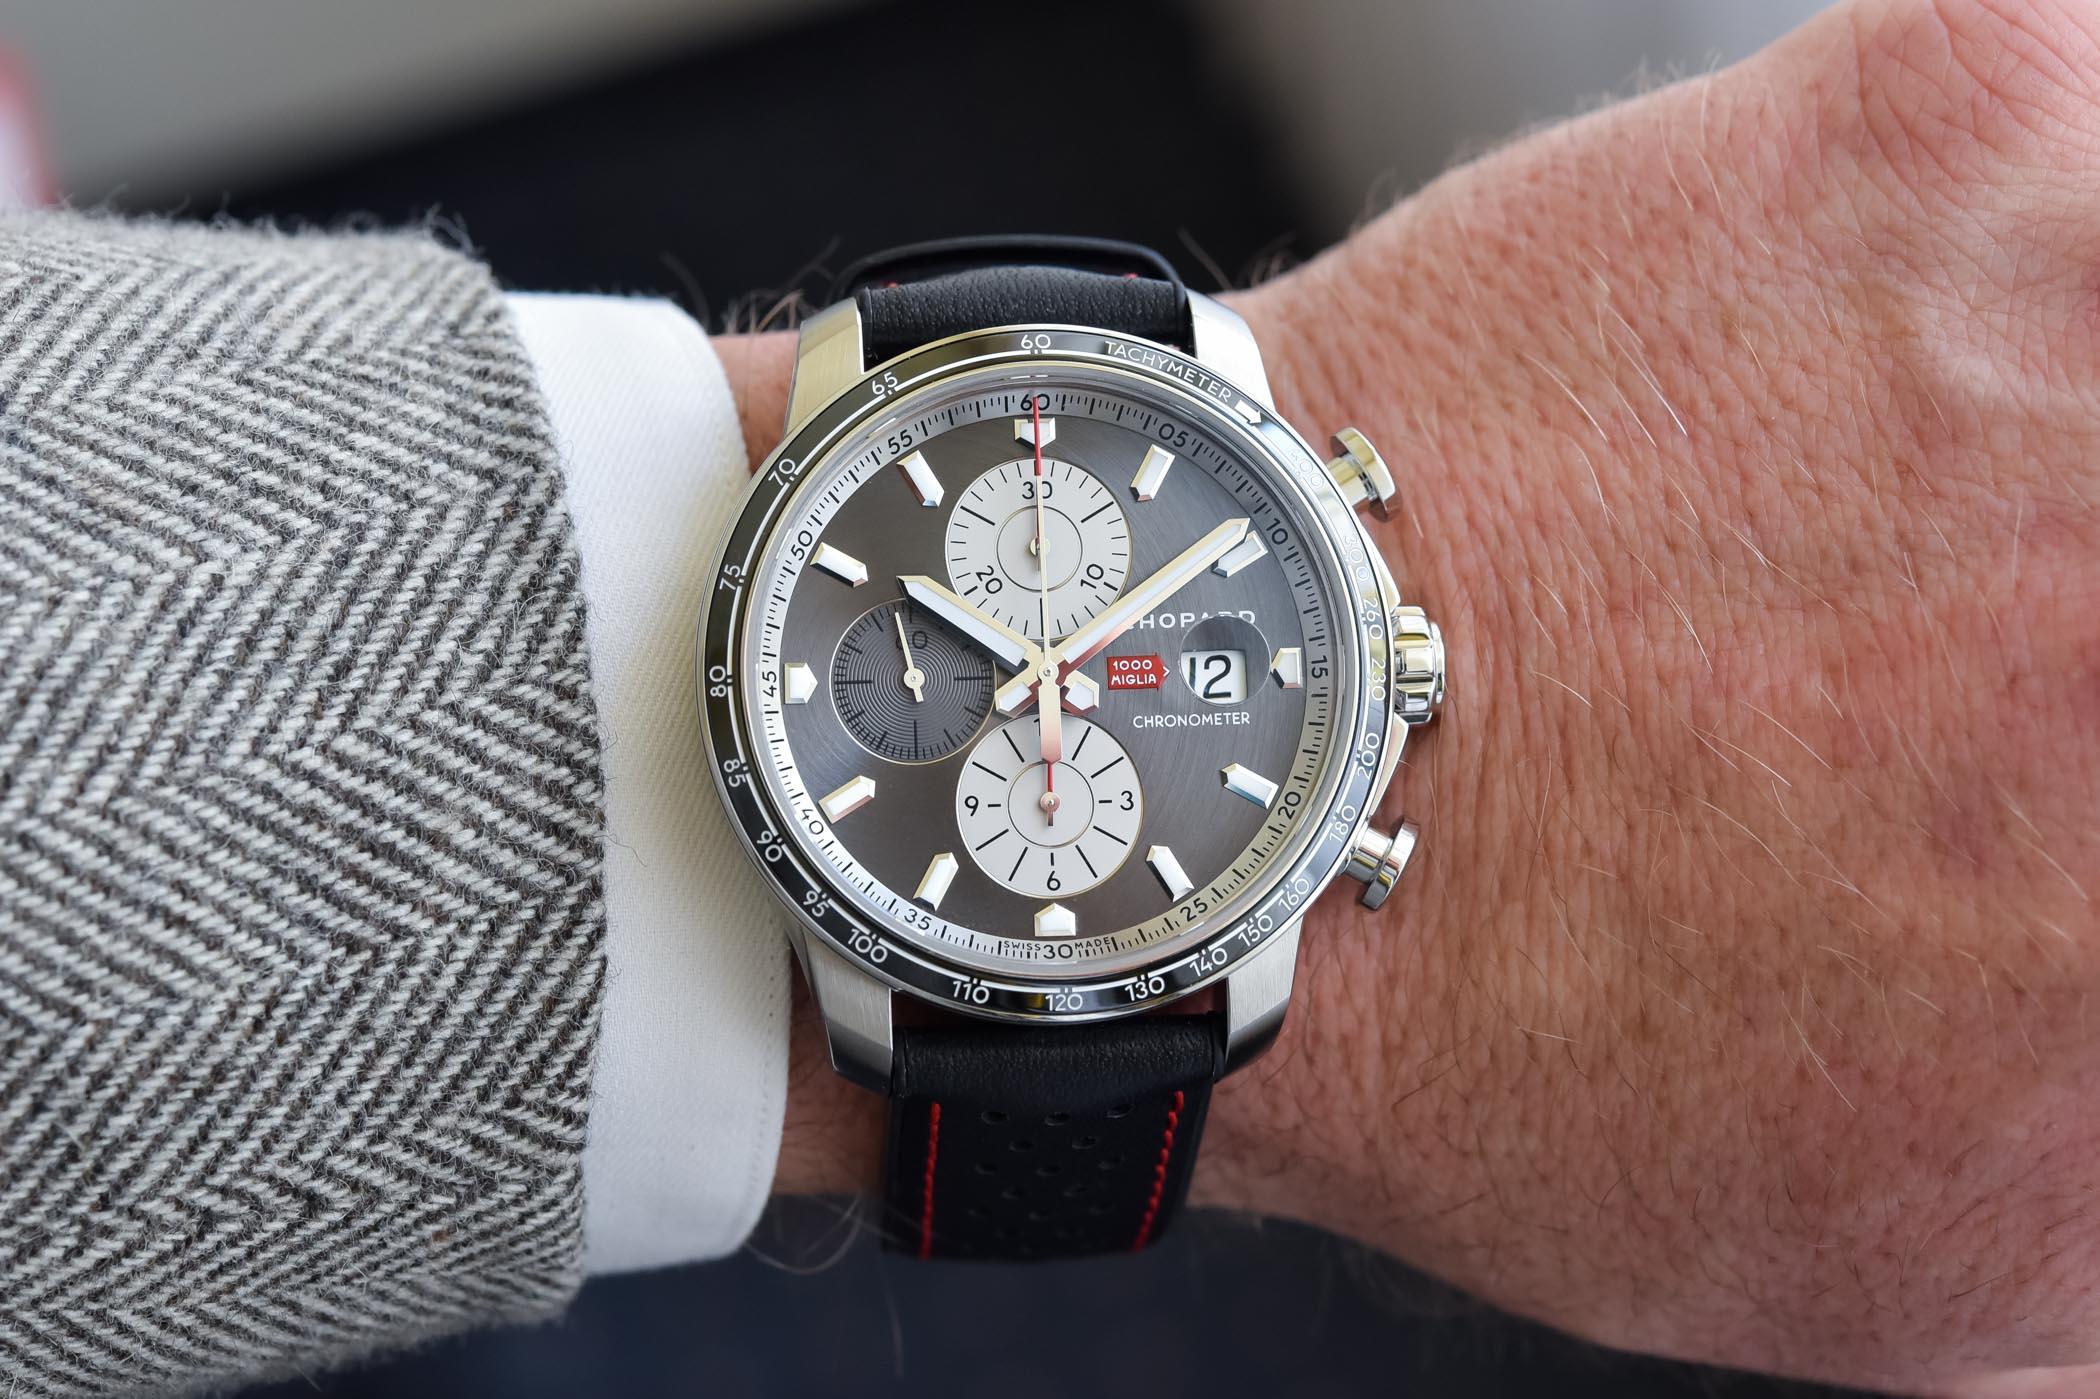 Chopard Mille Miglia 2021 Race Edition COSC Chronograph